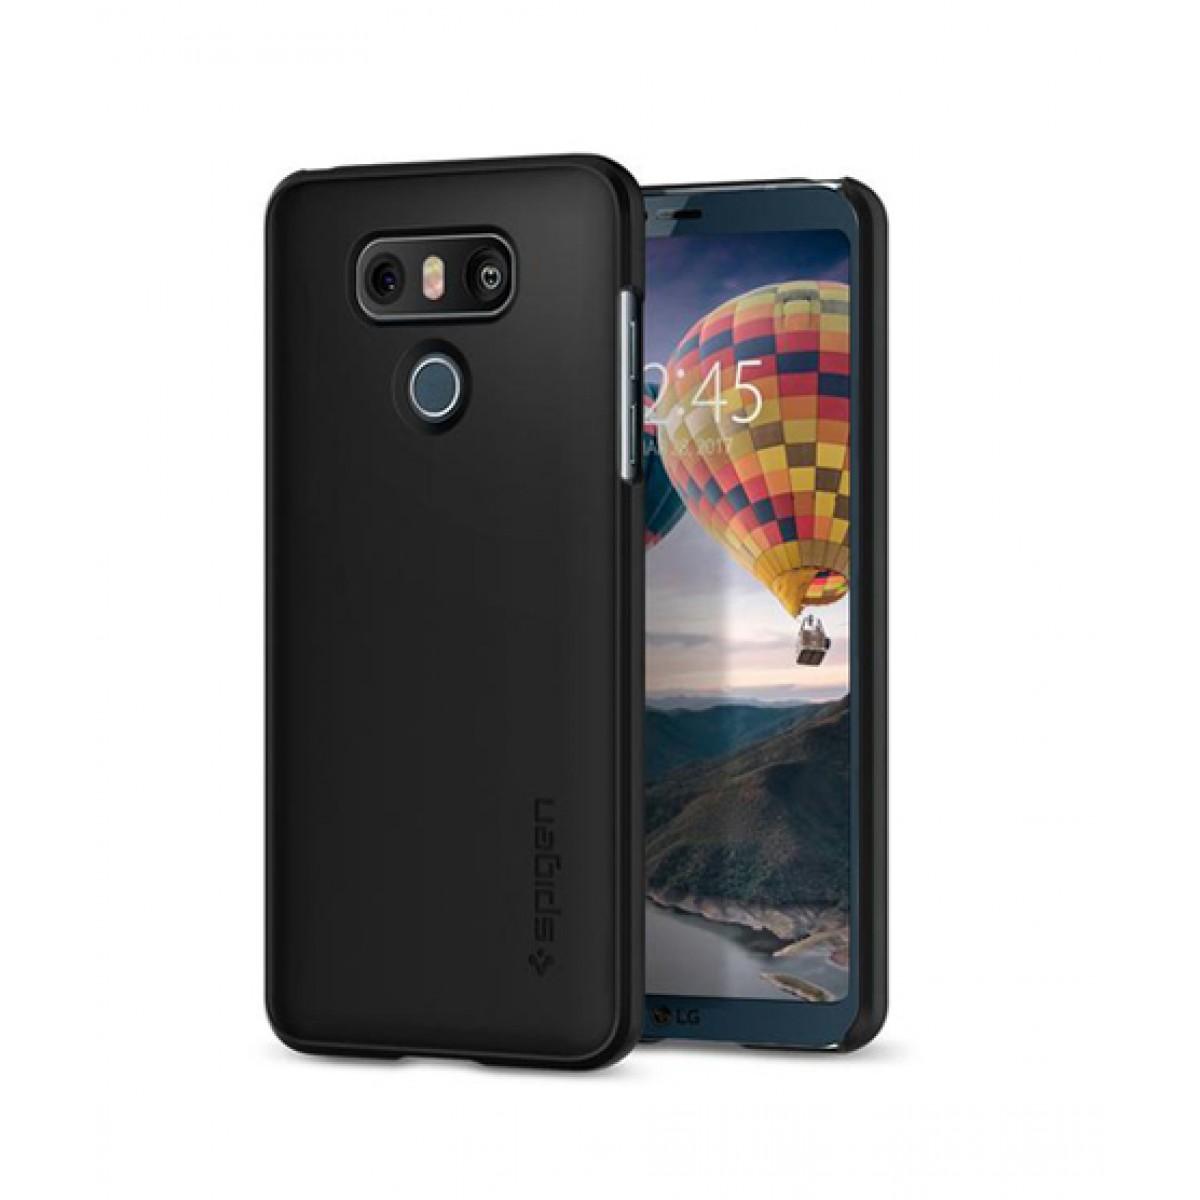 pretty nice 223c4 b2f73 Spigen Thin Fit Black Case For LG G6